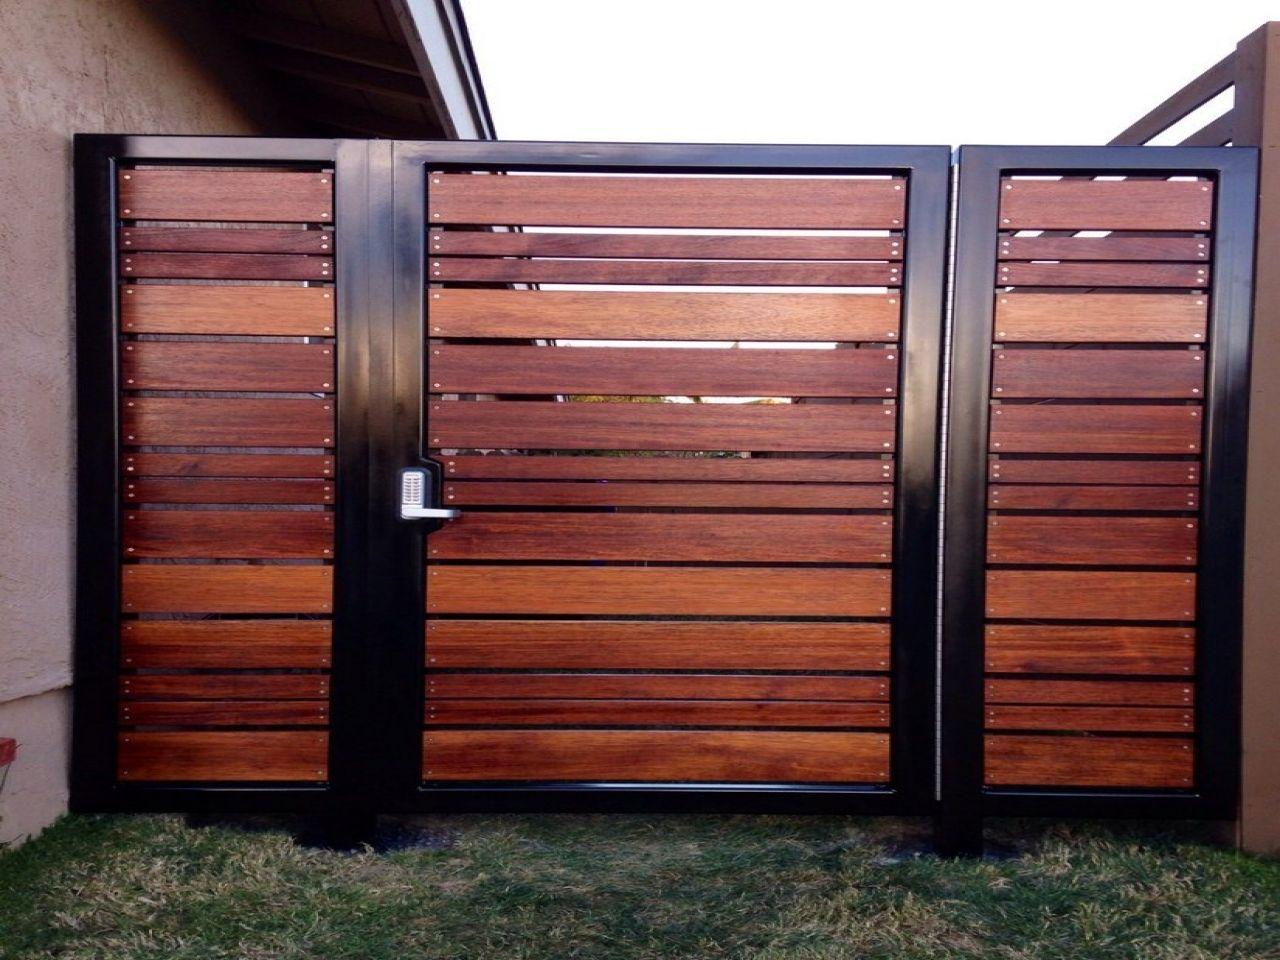 Fence design: modern fences and fences, photo 95